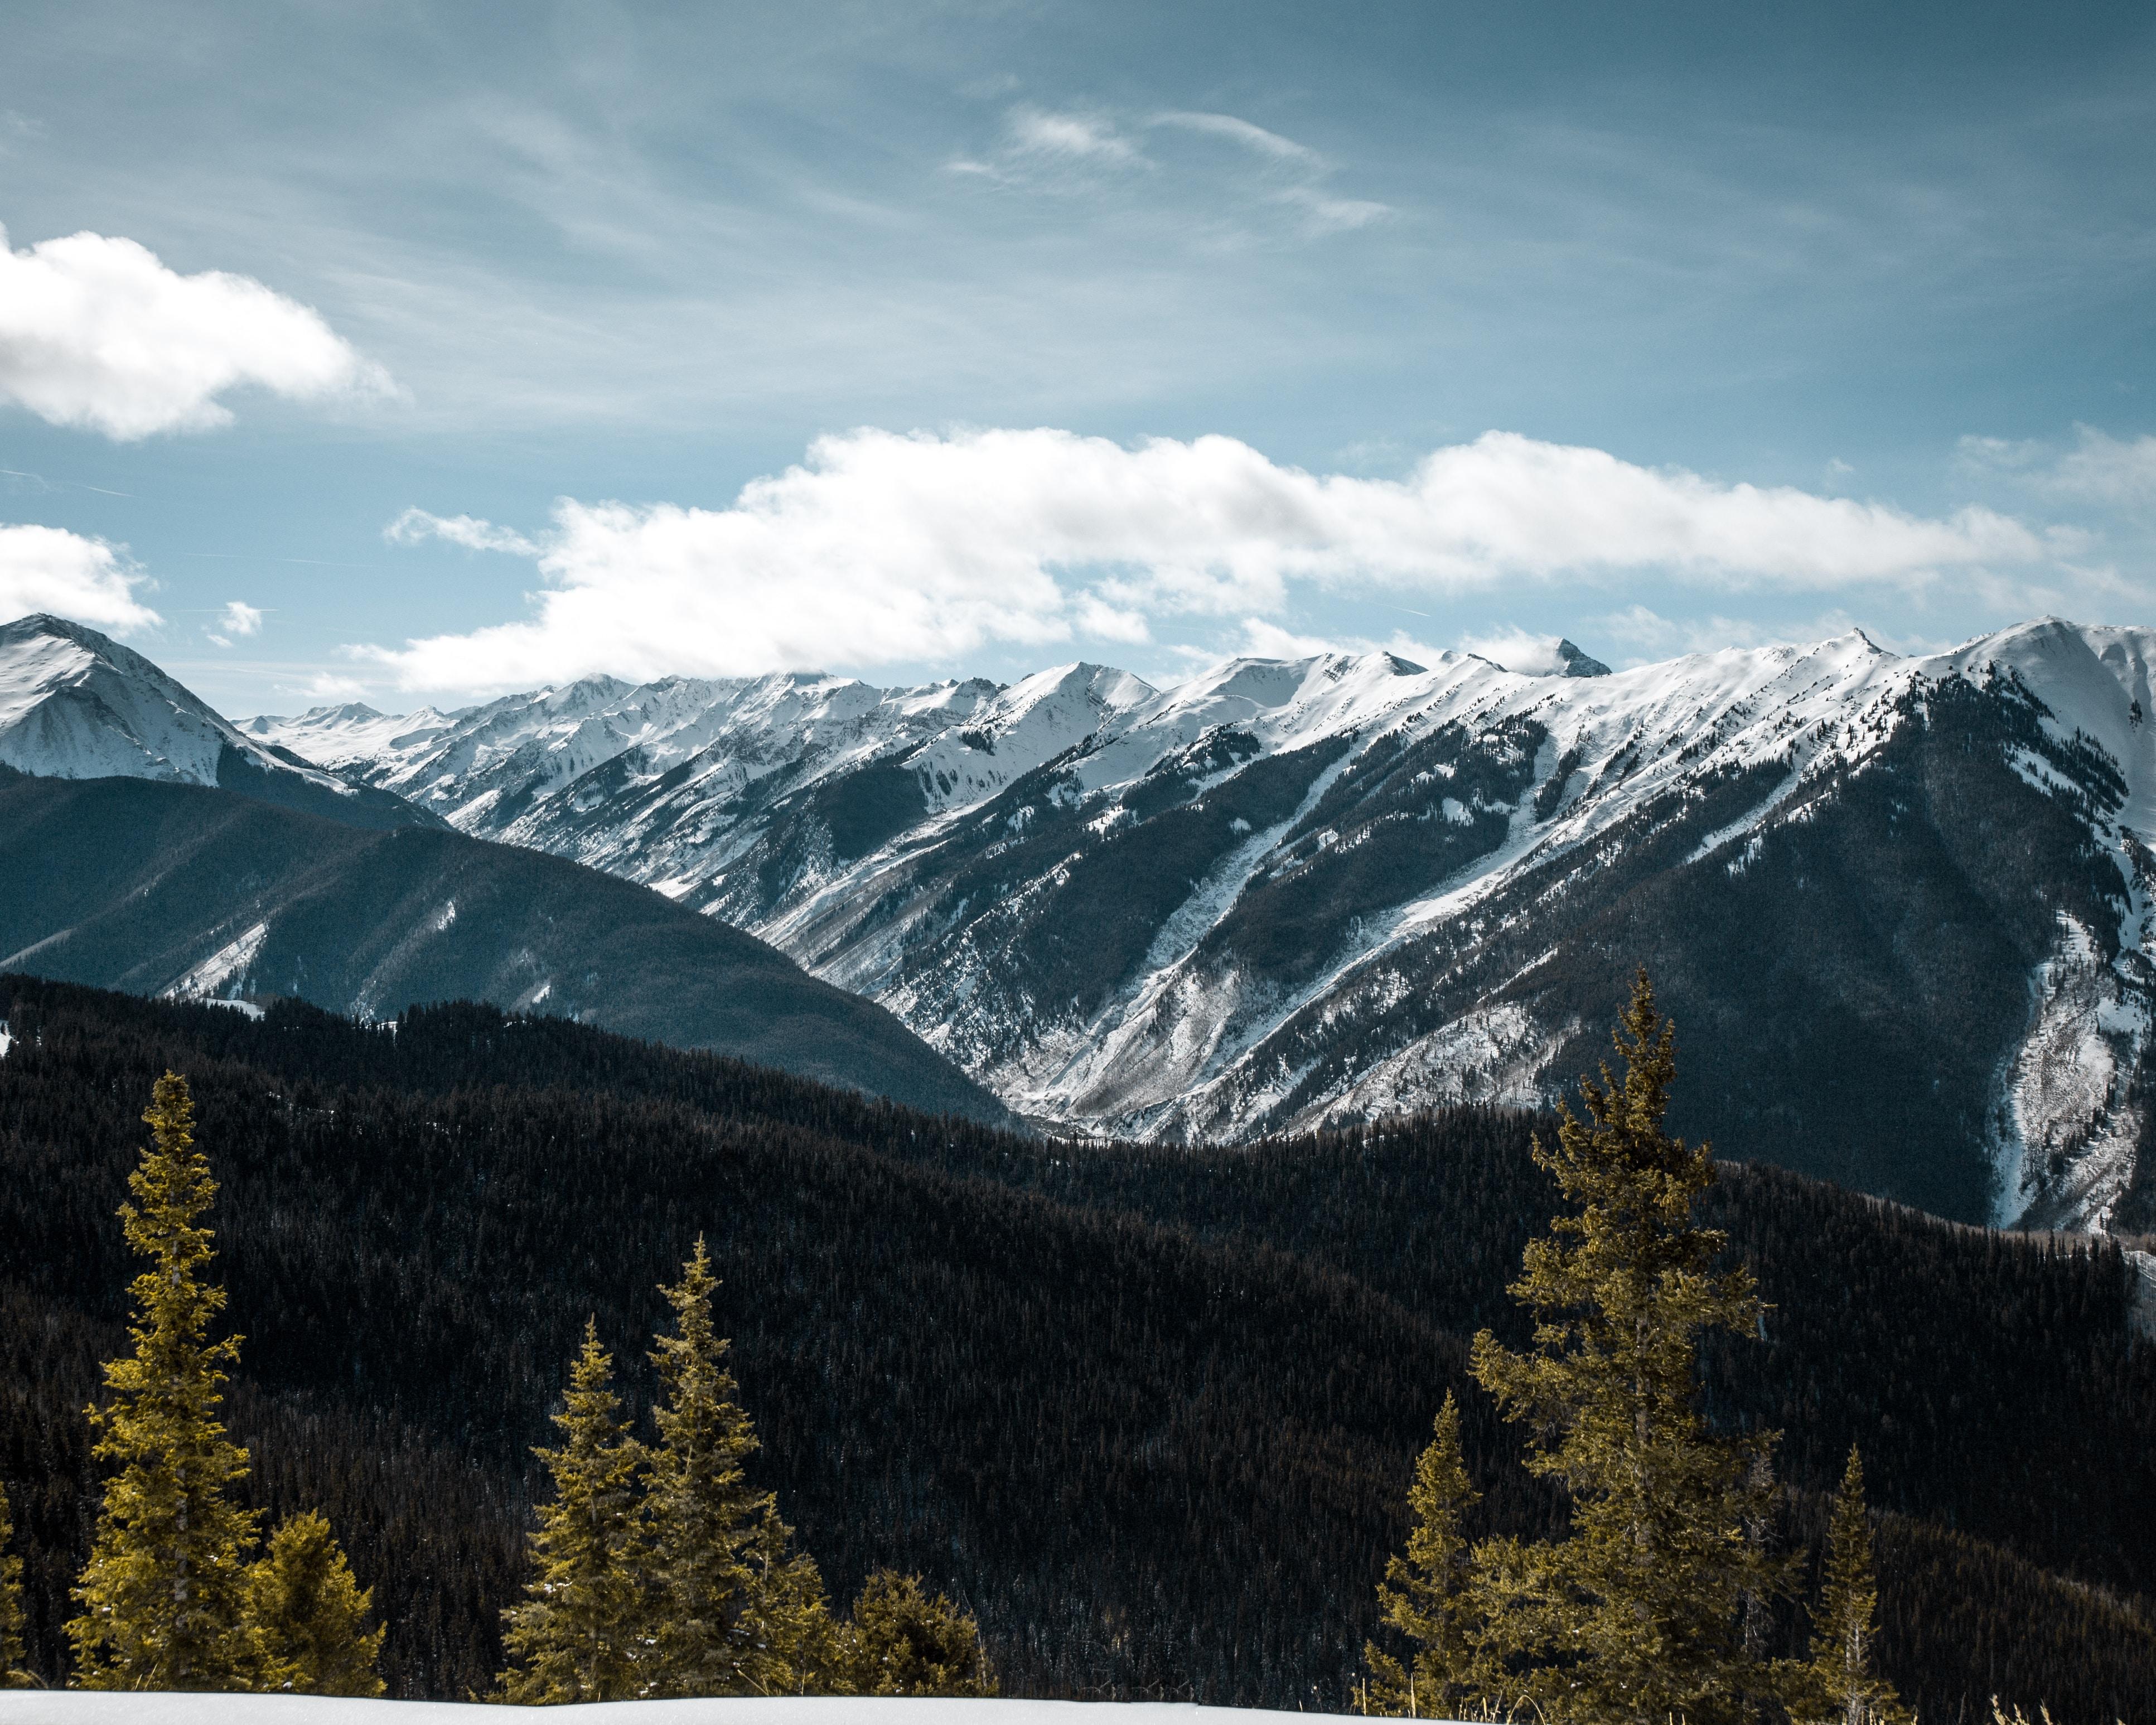 snow covered mountain range during daytime